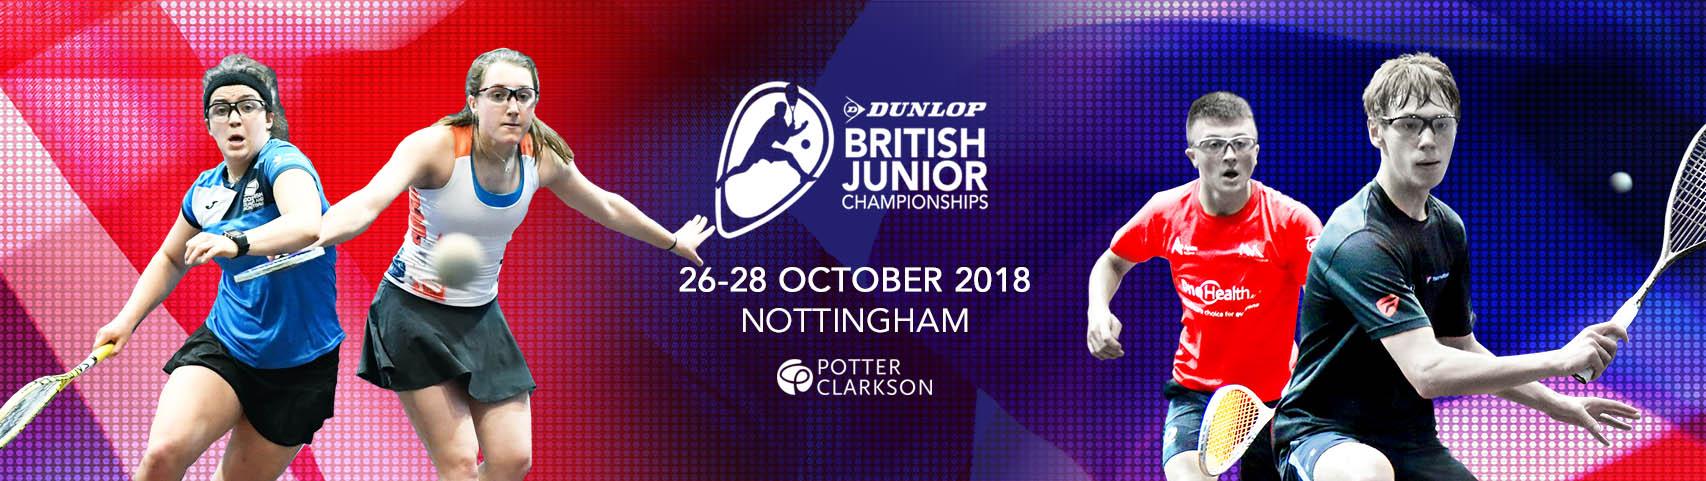 Dunlop British Junior Championships